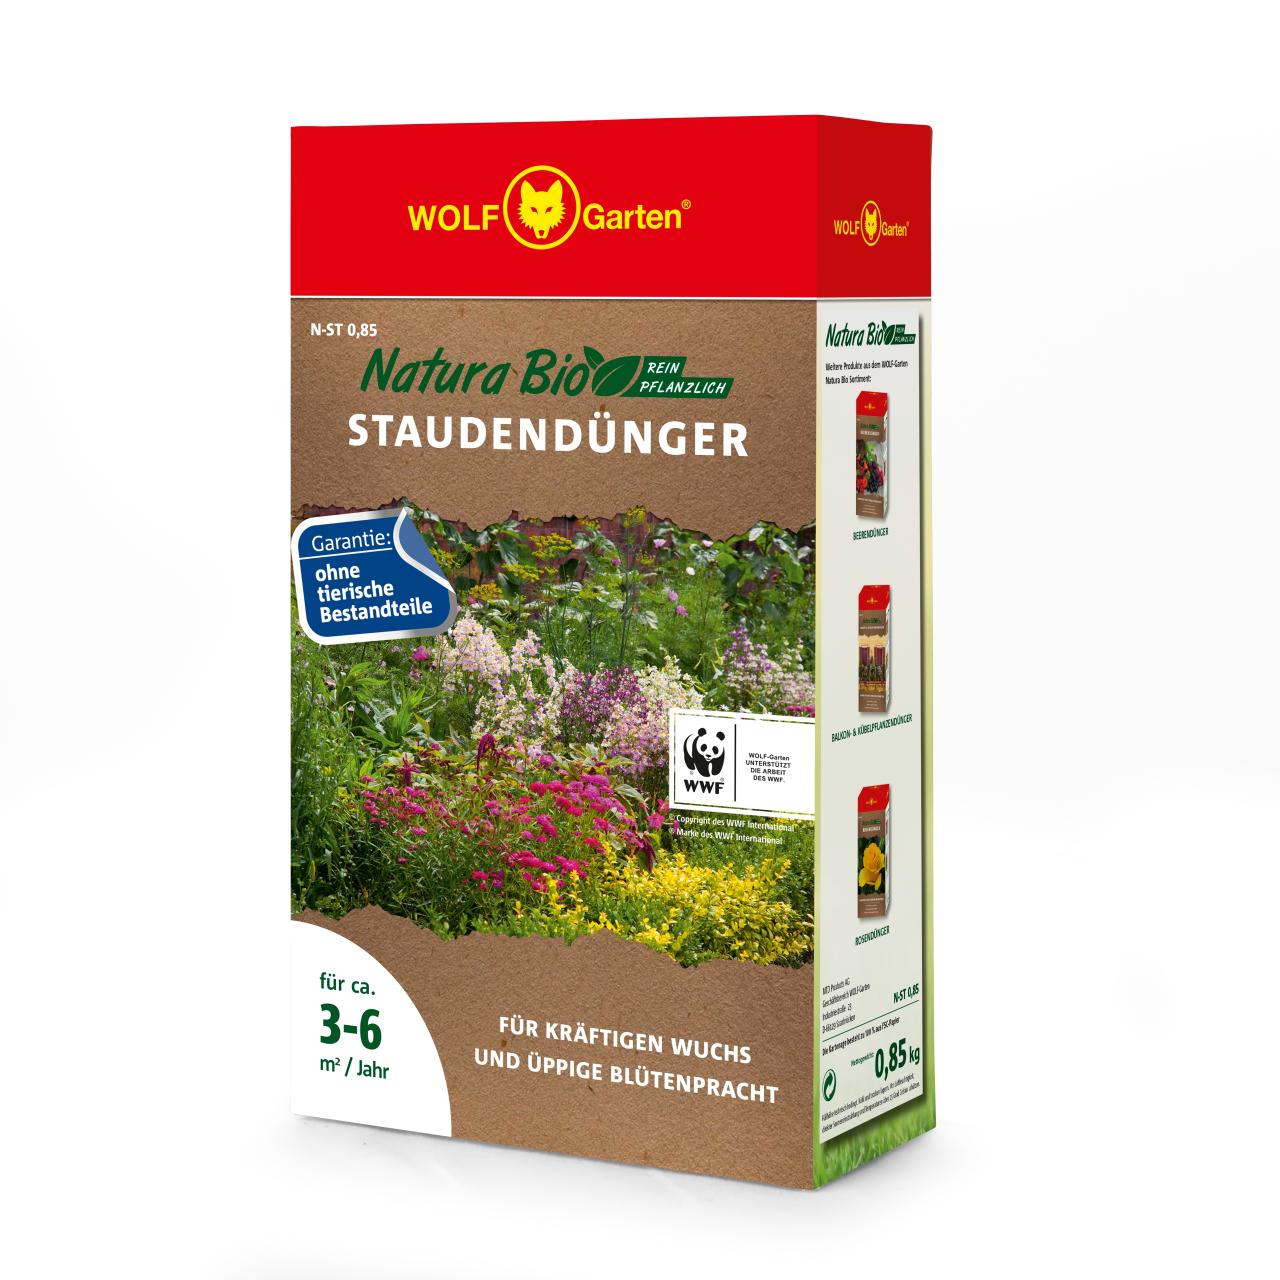 Natura Bio Rasendünger N-ST 0,85 D/A